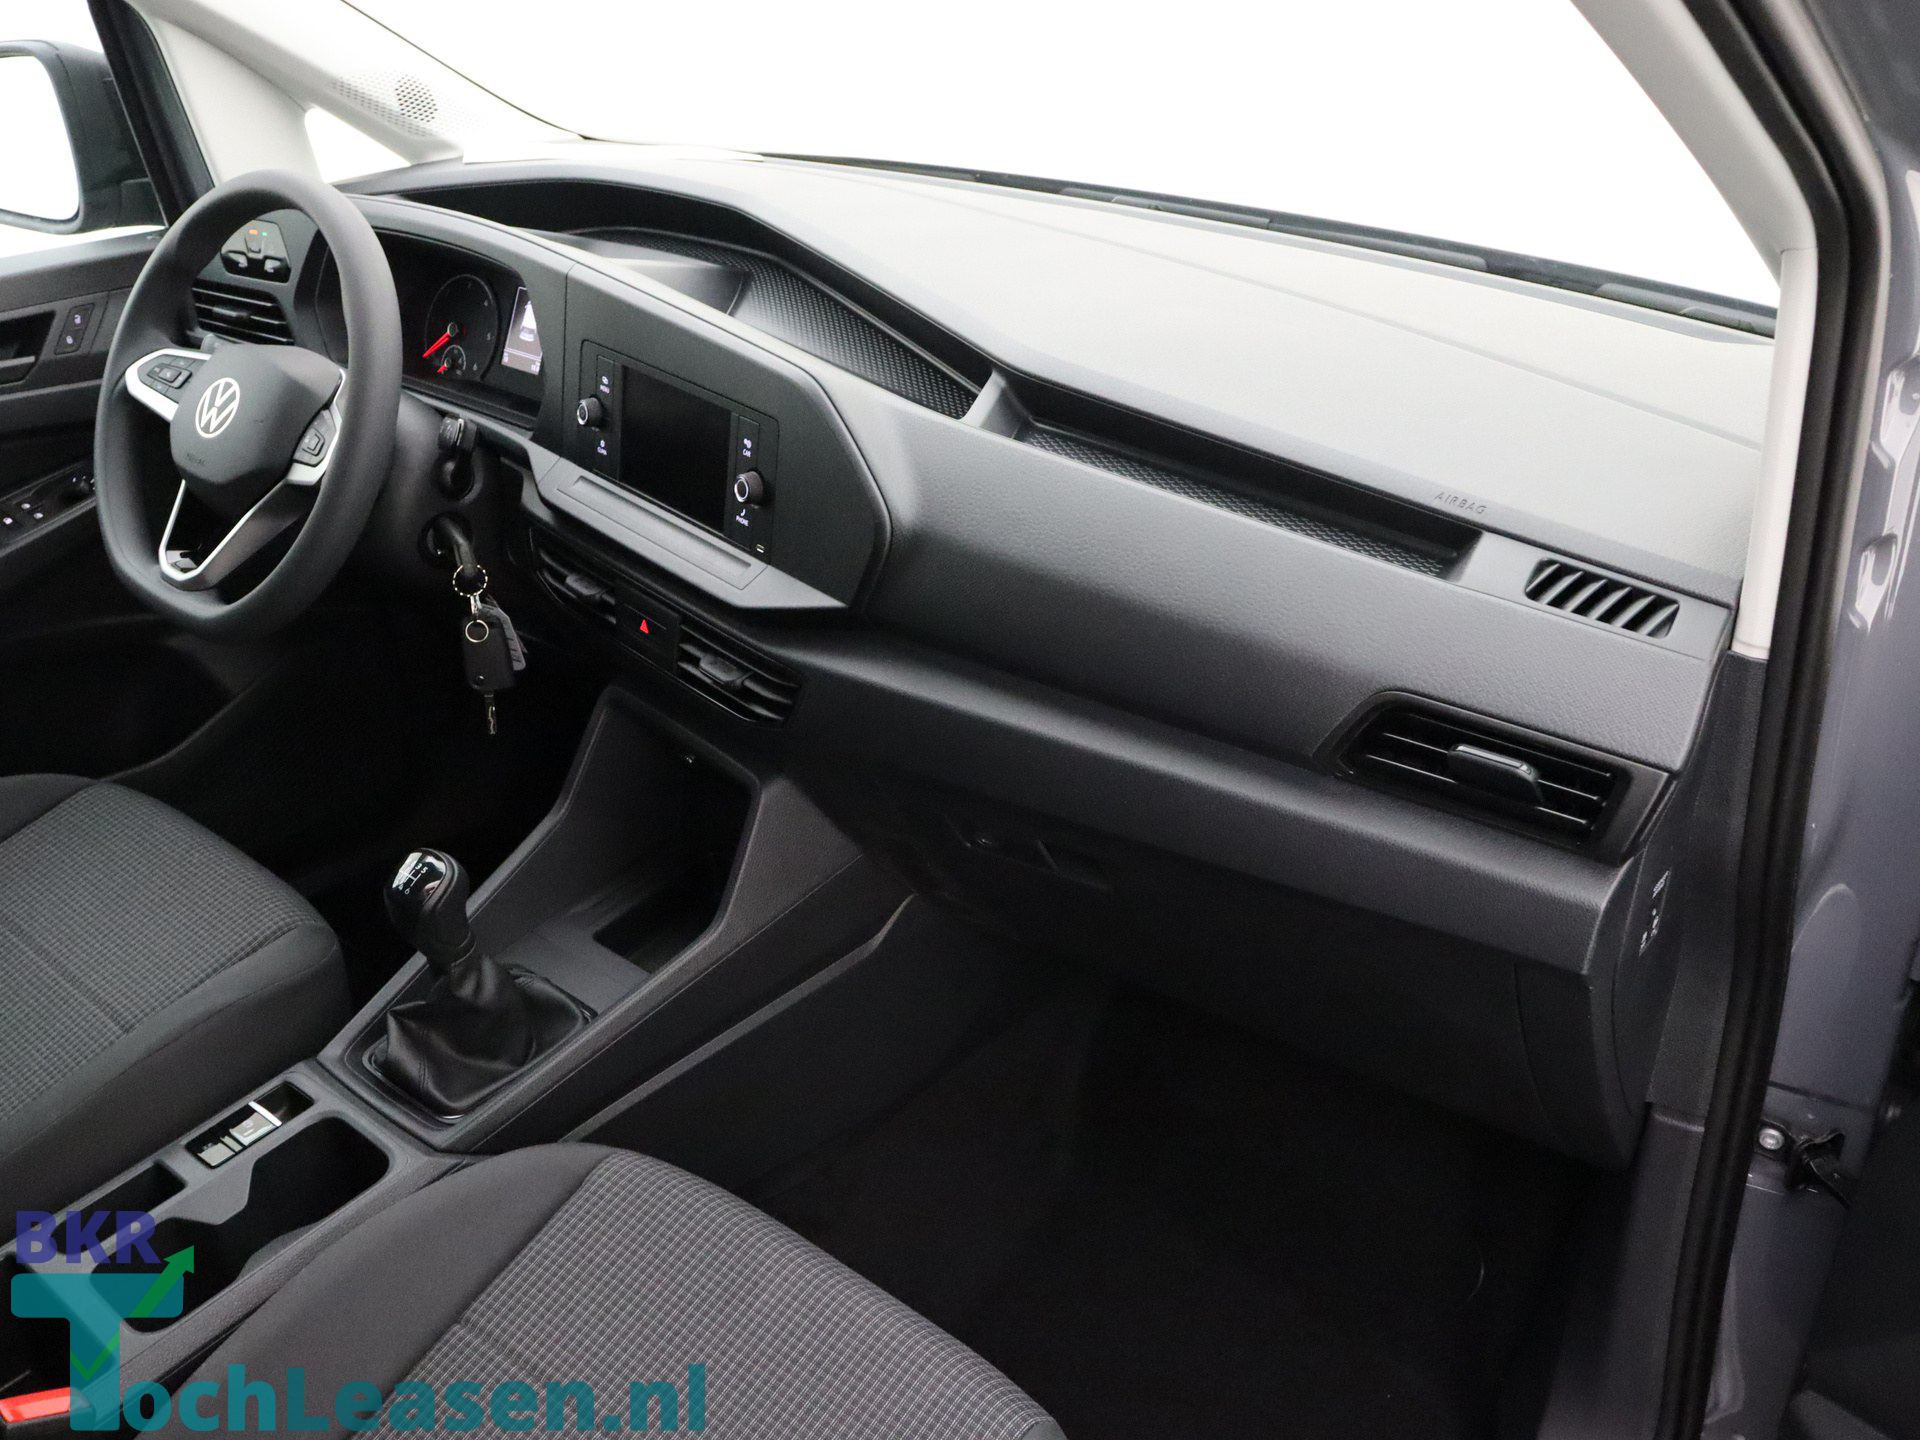 BKR toch leasen - Volkswagen Caddy - Grijs 11